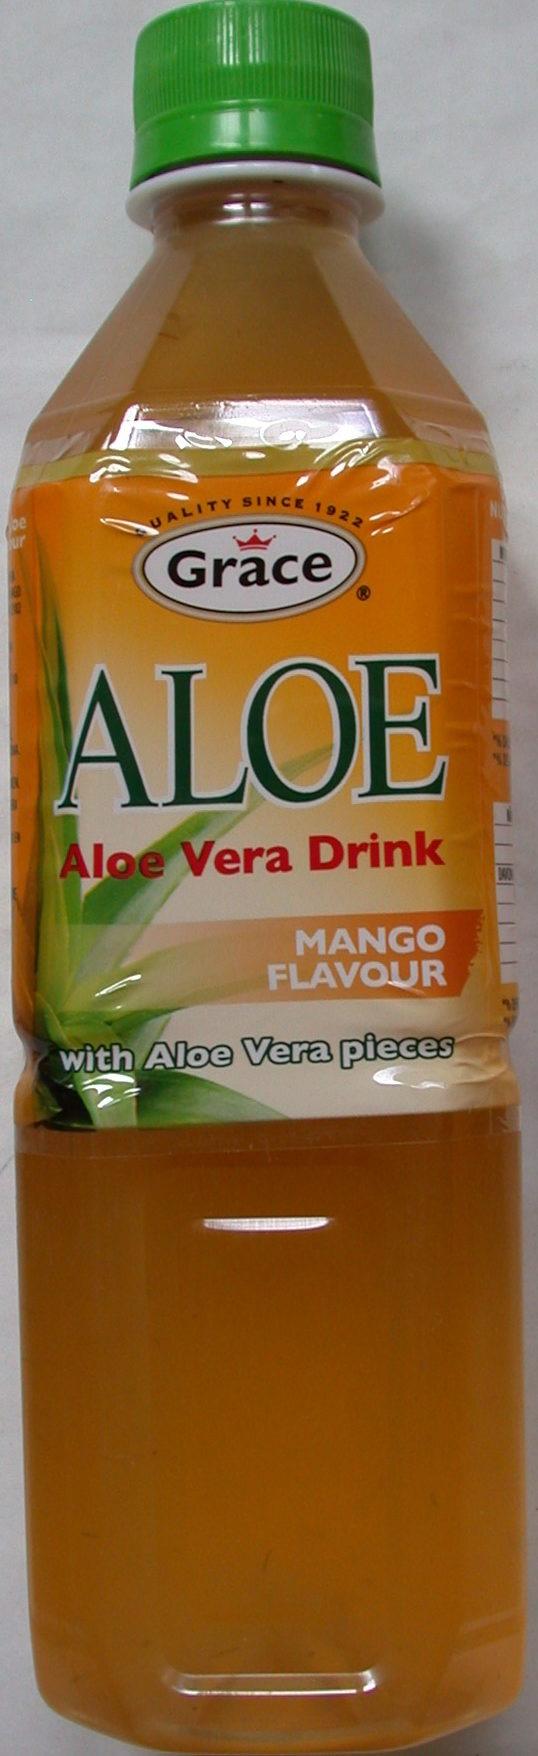 Aloe Vera Goût Mangue - Product